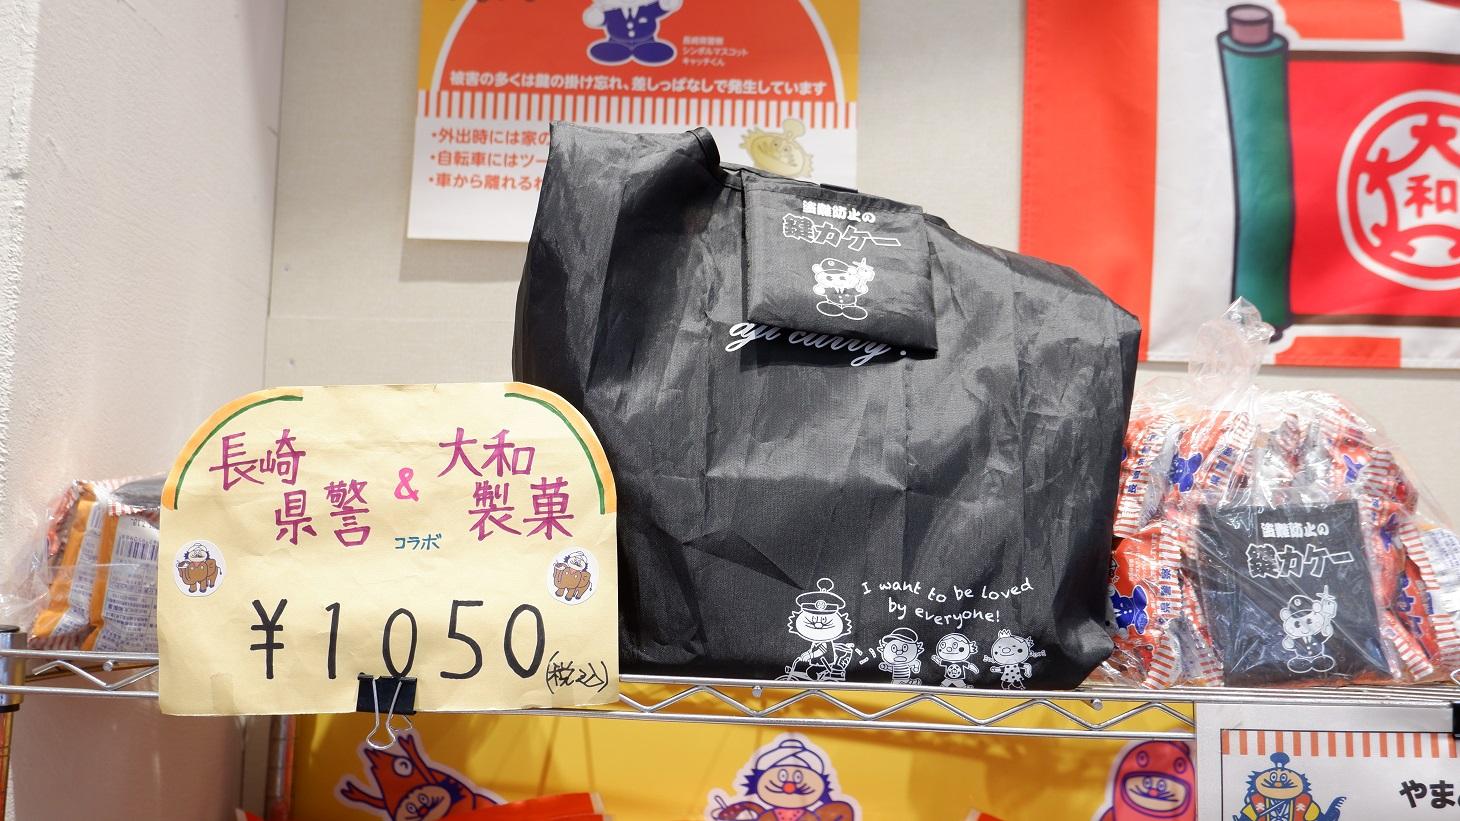 大和製菓 長崎県警コラボ商品